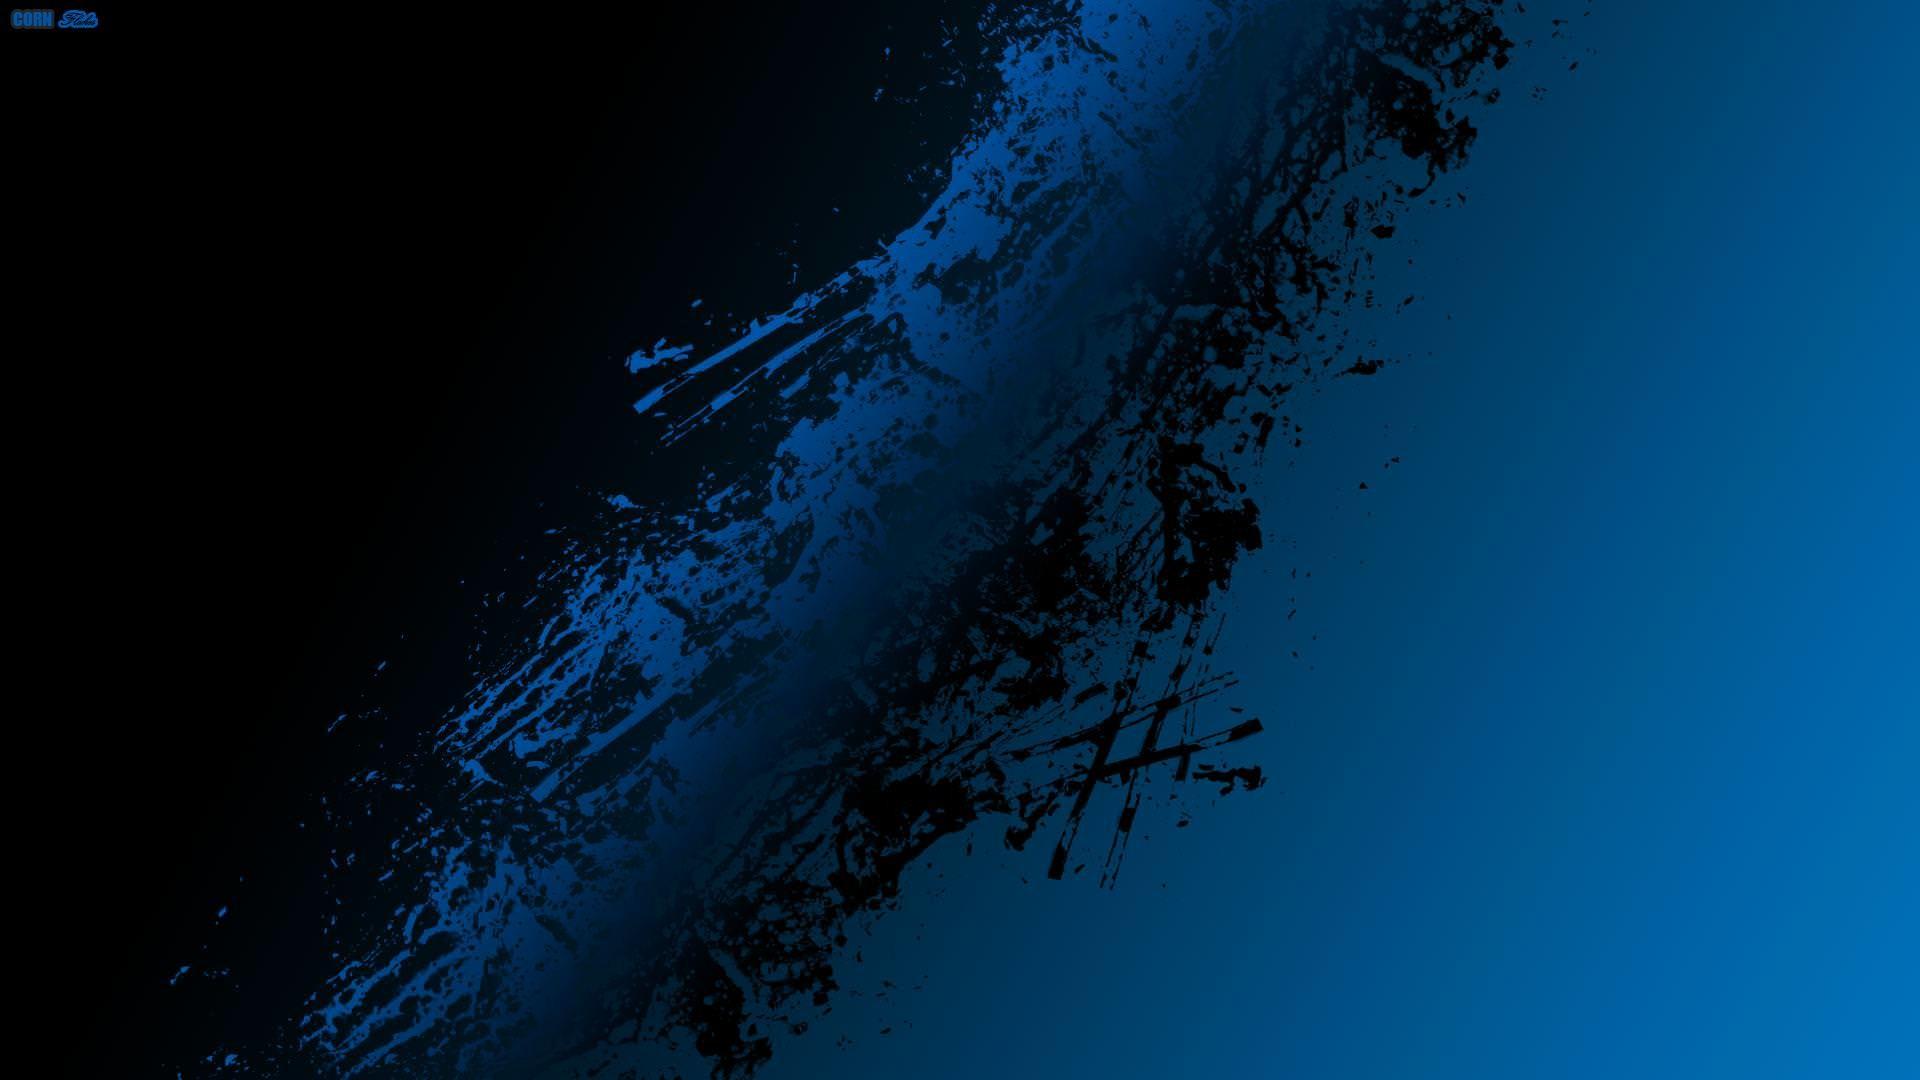 Black And Blue Abstract Wallpaper Wallpapertag